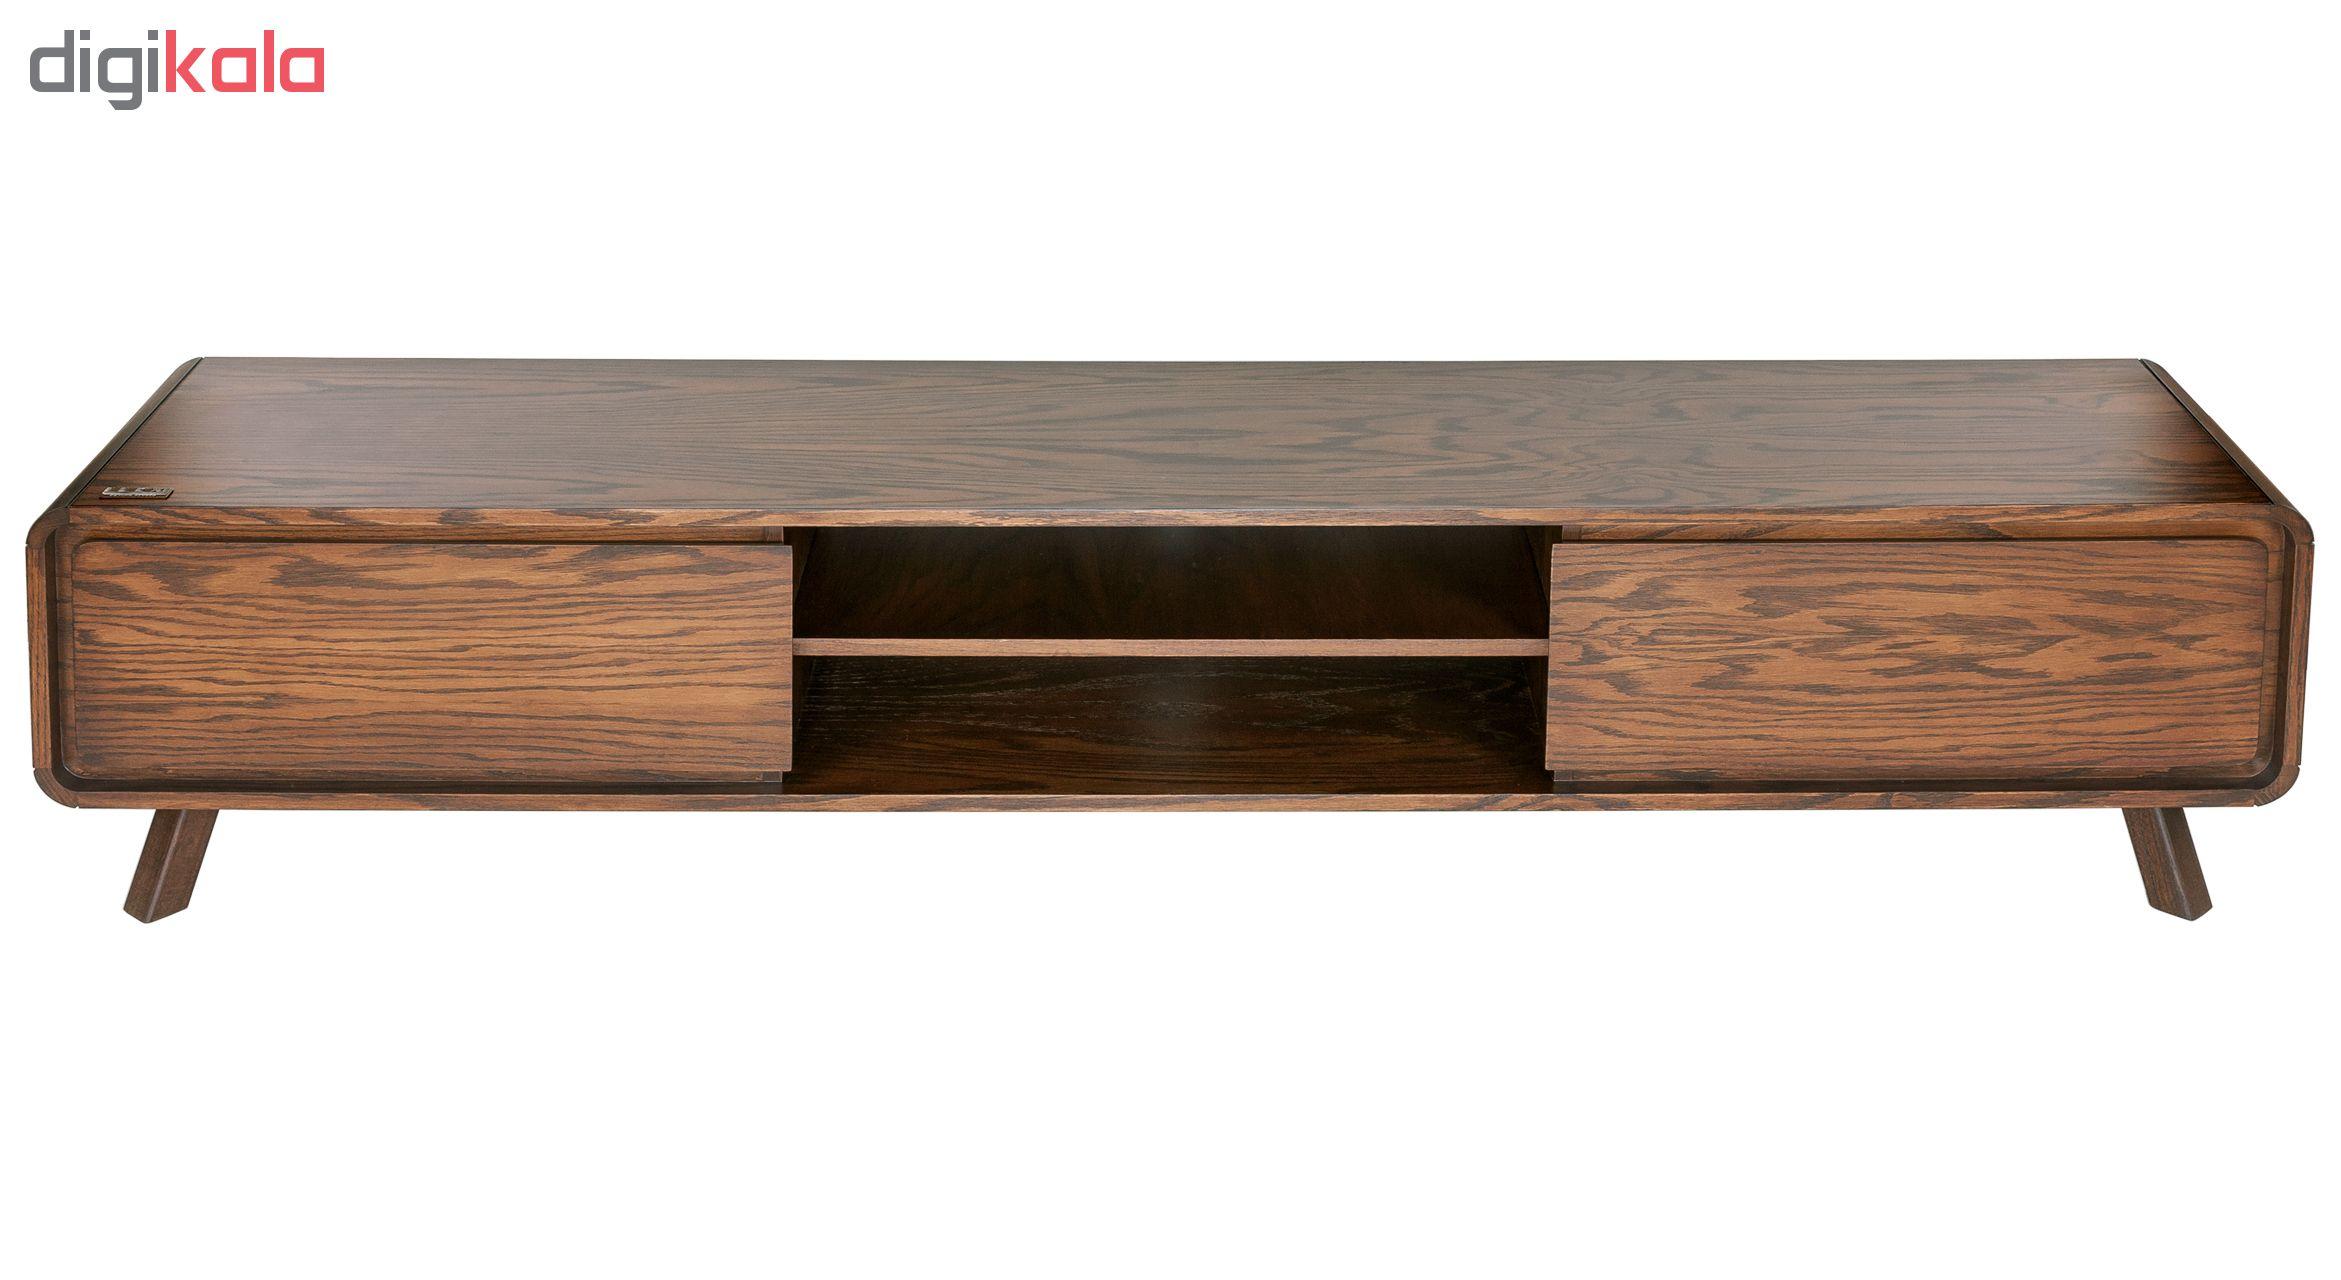 میز تلویزیون آیلکس مدل LONIZ-WALNUT-220